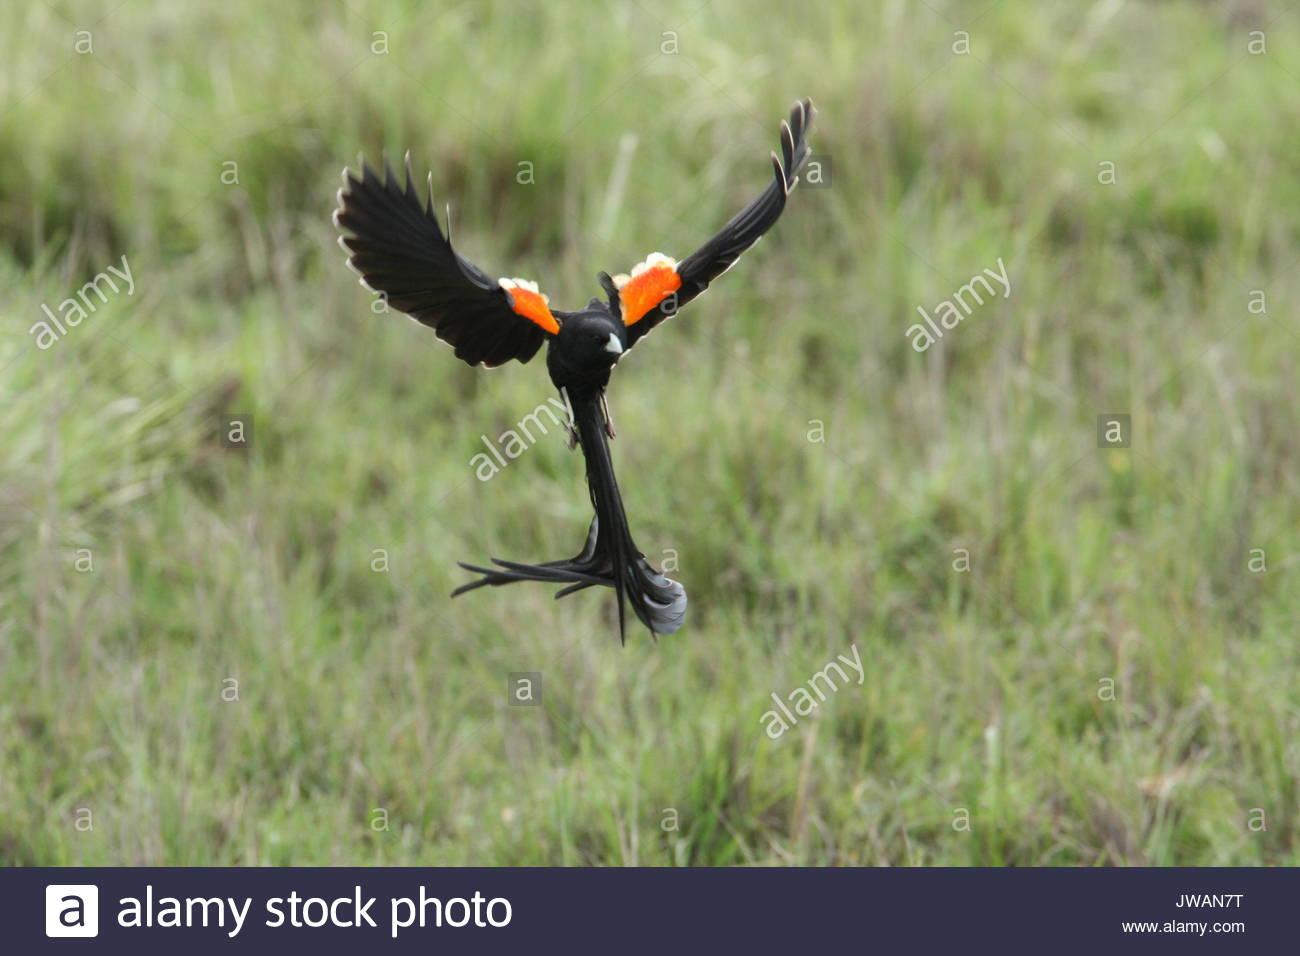 Long-tailed widowbird,Euplectes progne. - Stock Image